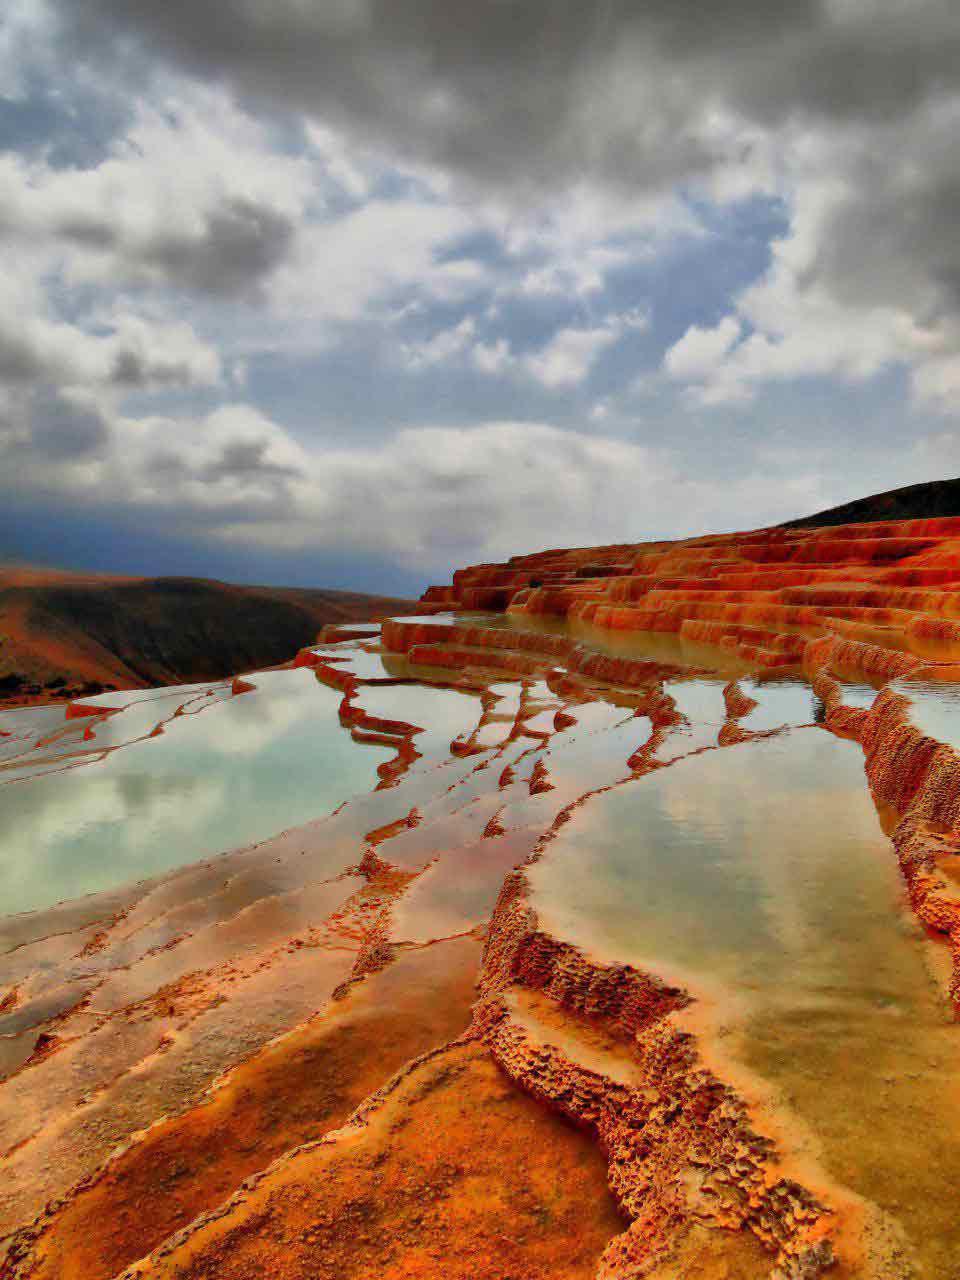 Travel-to-Iran-tours-to-Iran-bucket-list